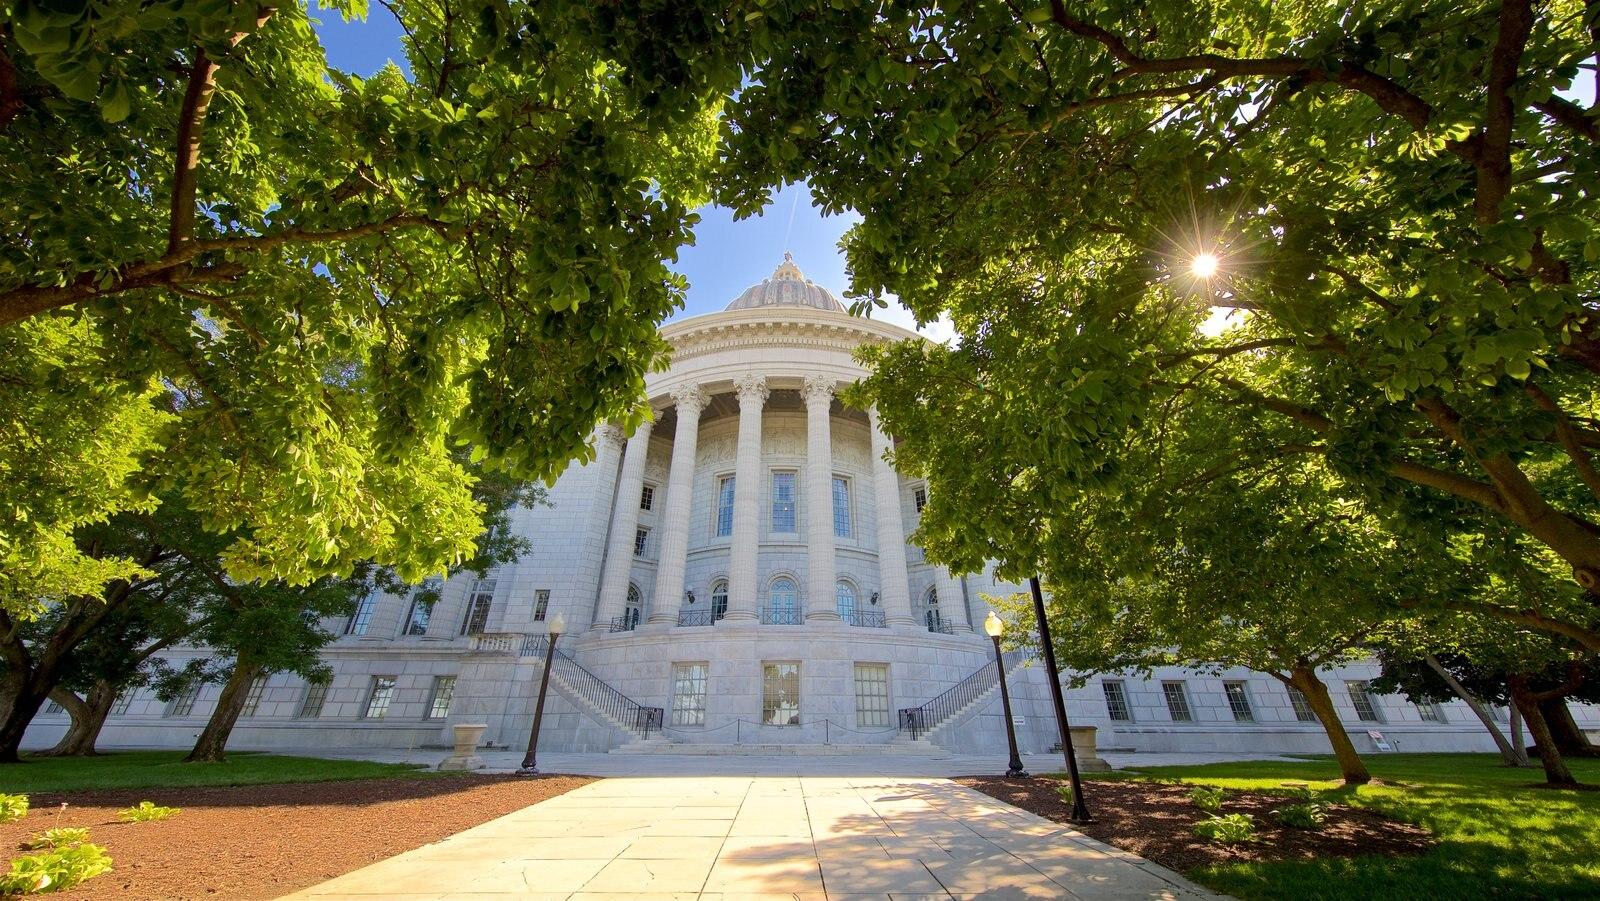 Missouri State Capitol featuring heritage architecture